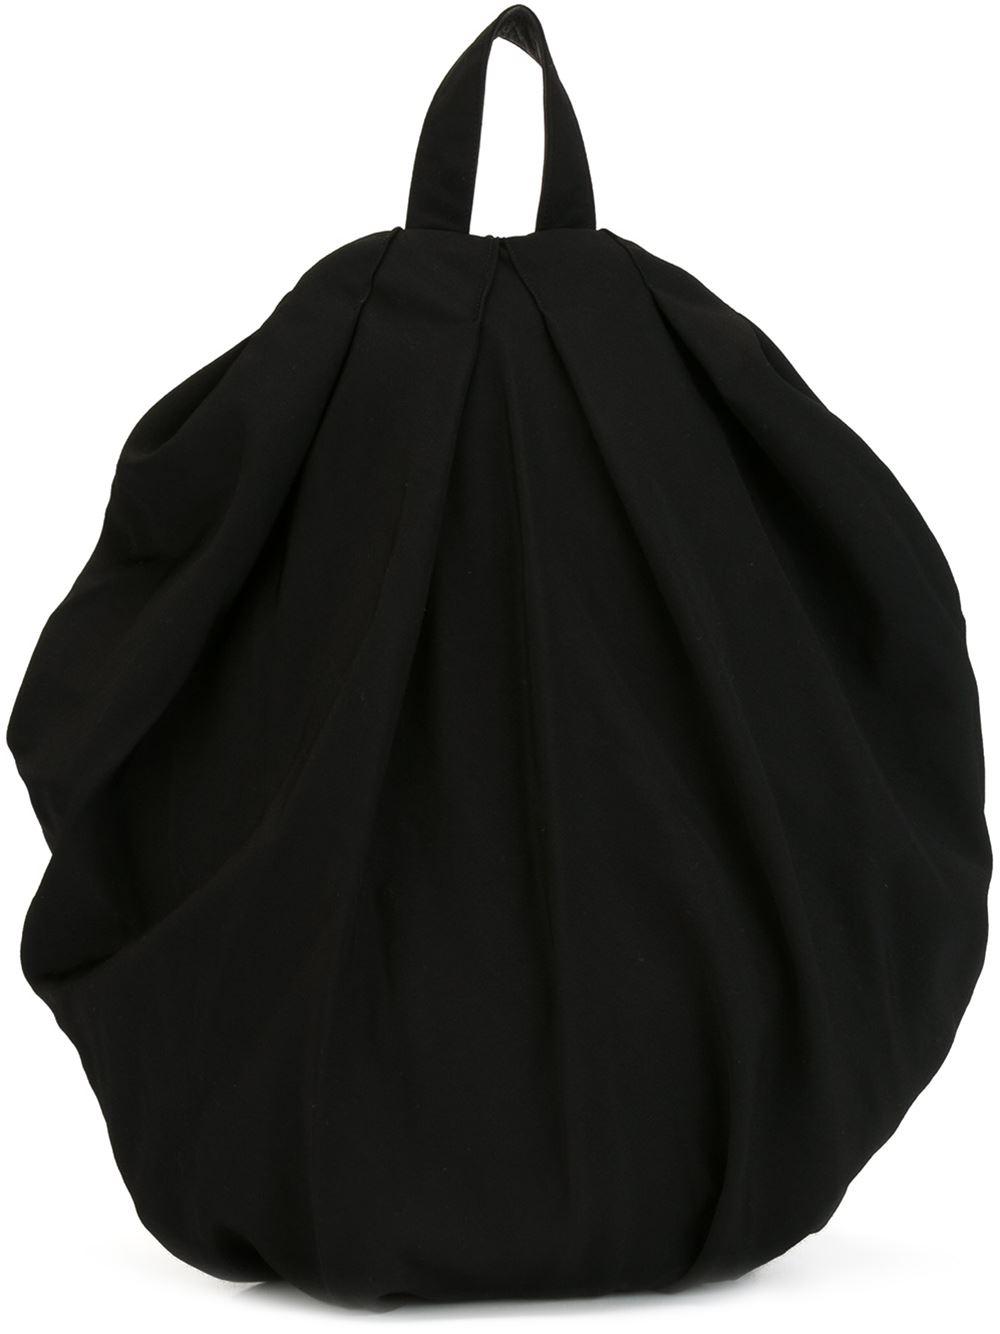 Lyst - Yohji Yamamoto Round Draped Backpack in Black 74ea67641f